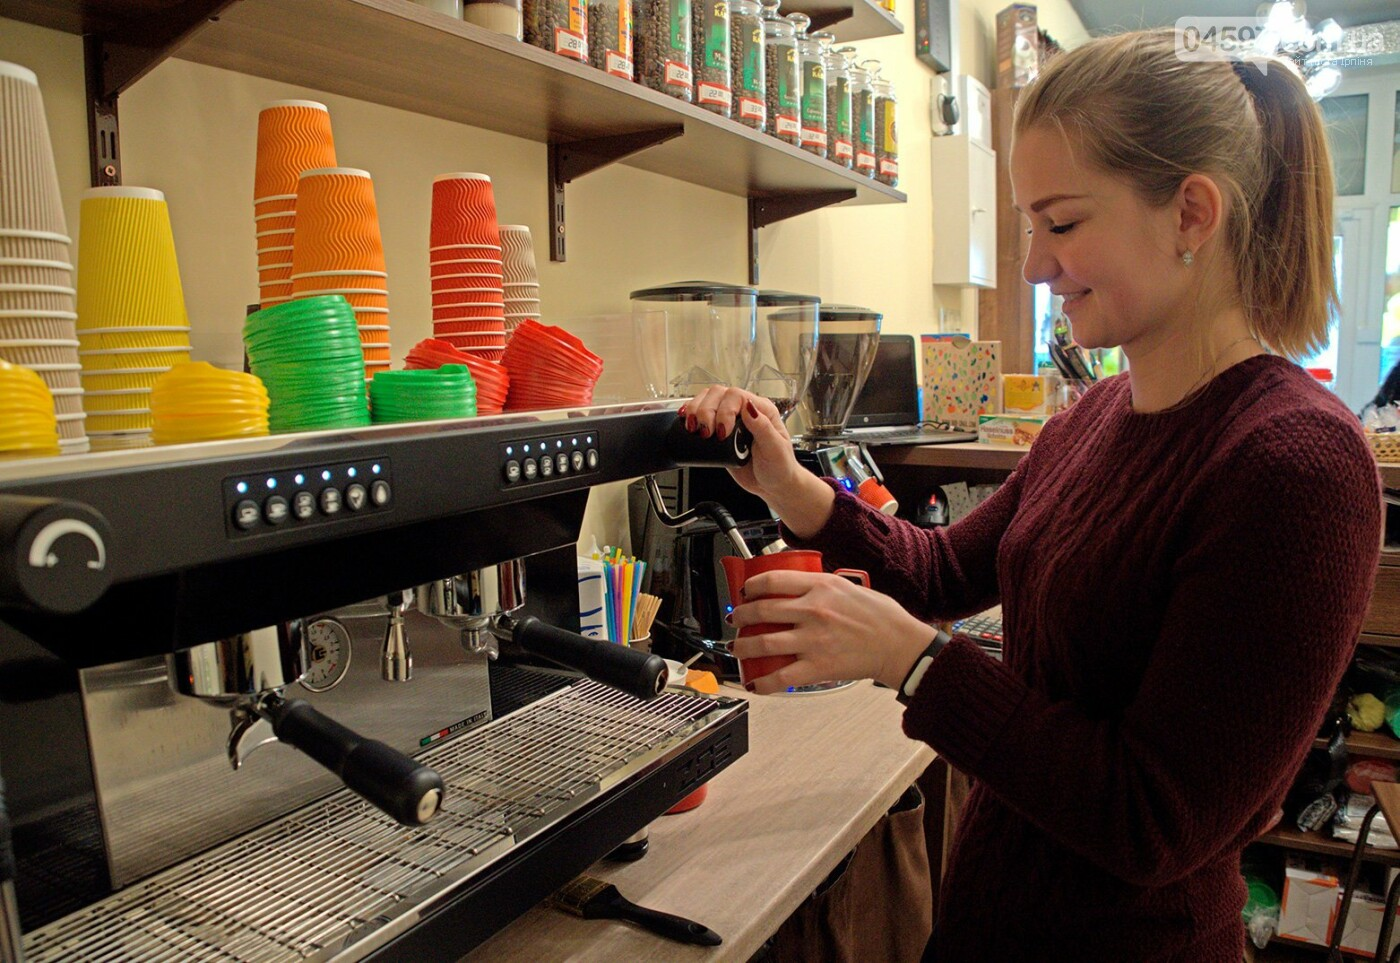 Аmore coffee - смачна кава в Ірпені!, фото-1